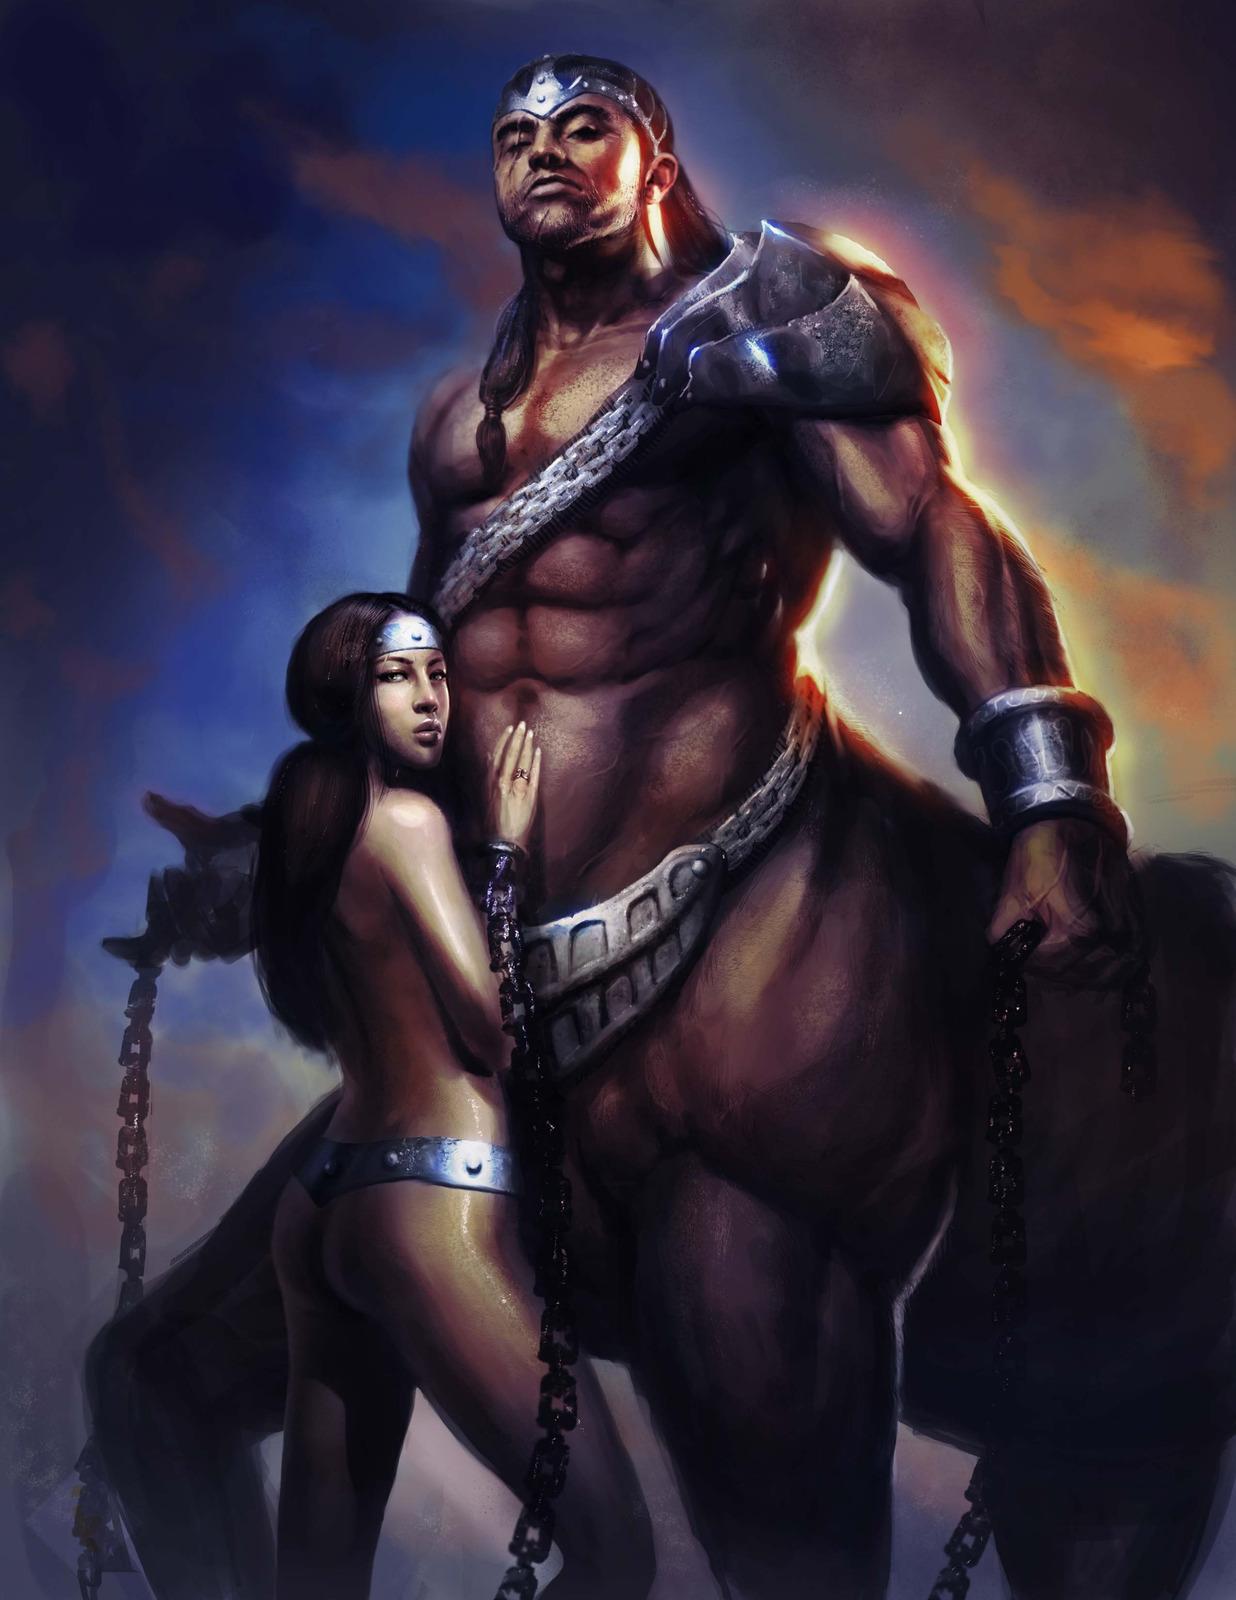 Hot centaur nude movies